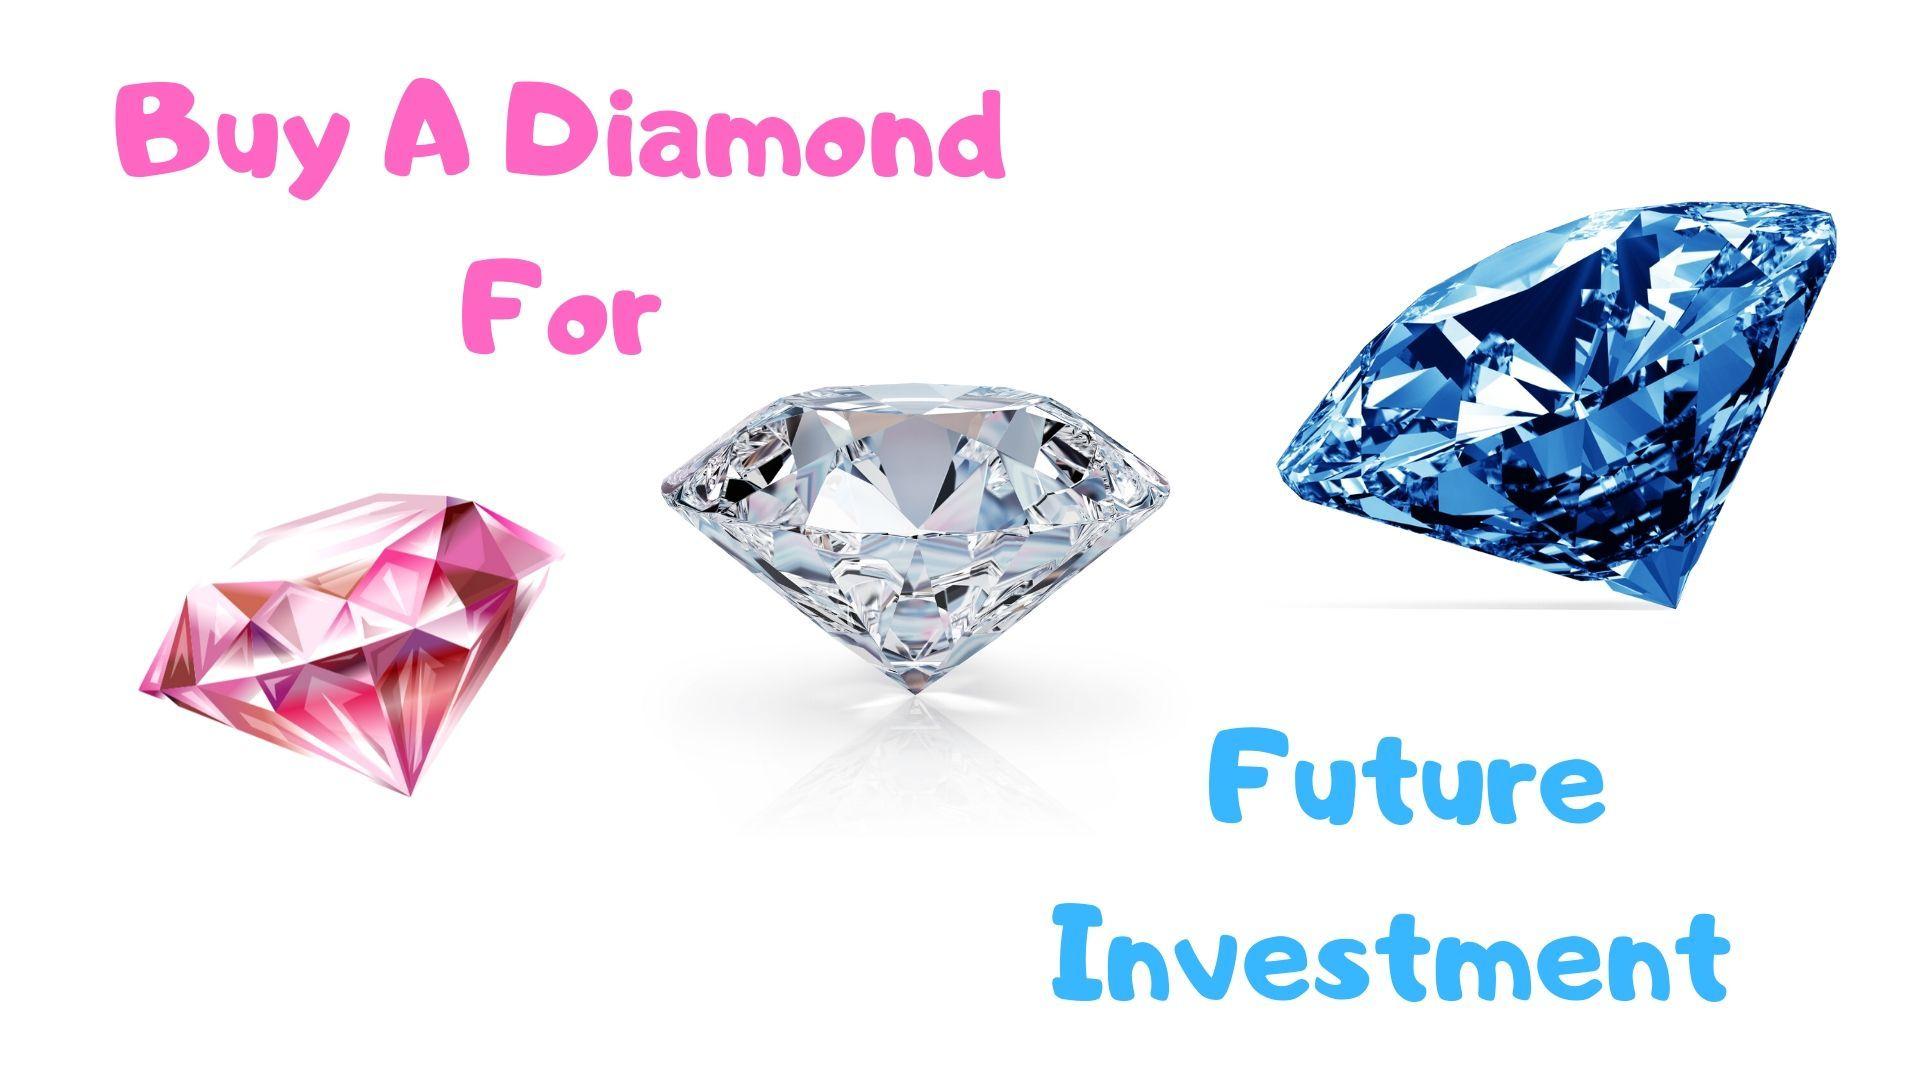 invest in diamonds